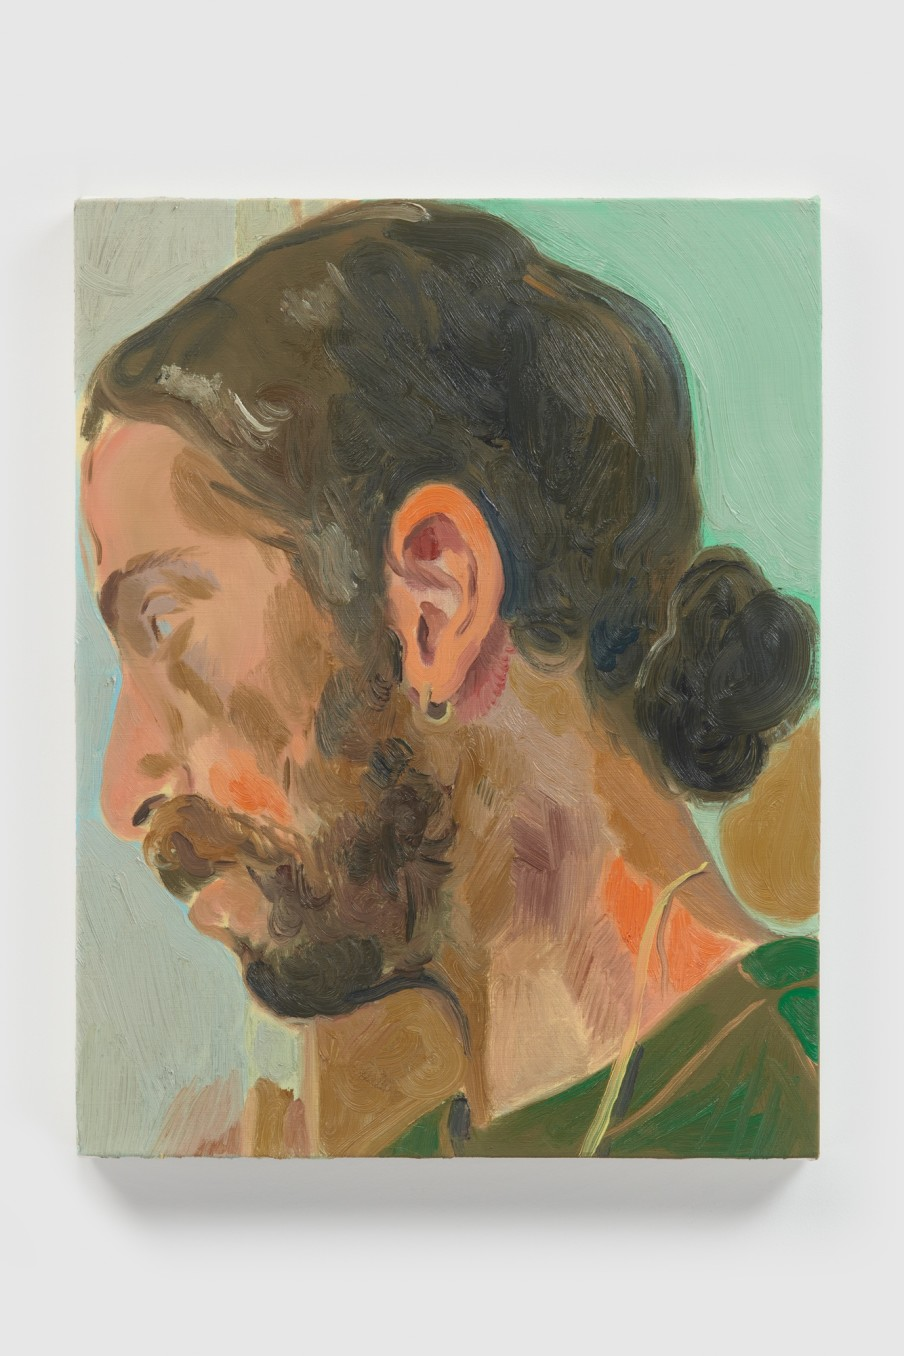 Anthony Cudahy Ian profile, 2021 Oil on linen 46 x 36 x 3 cm 18 1/8 x 14 1/8 x...